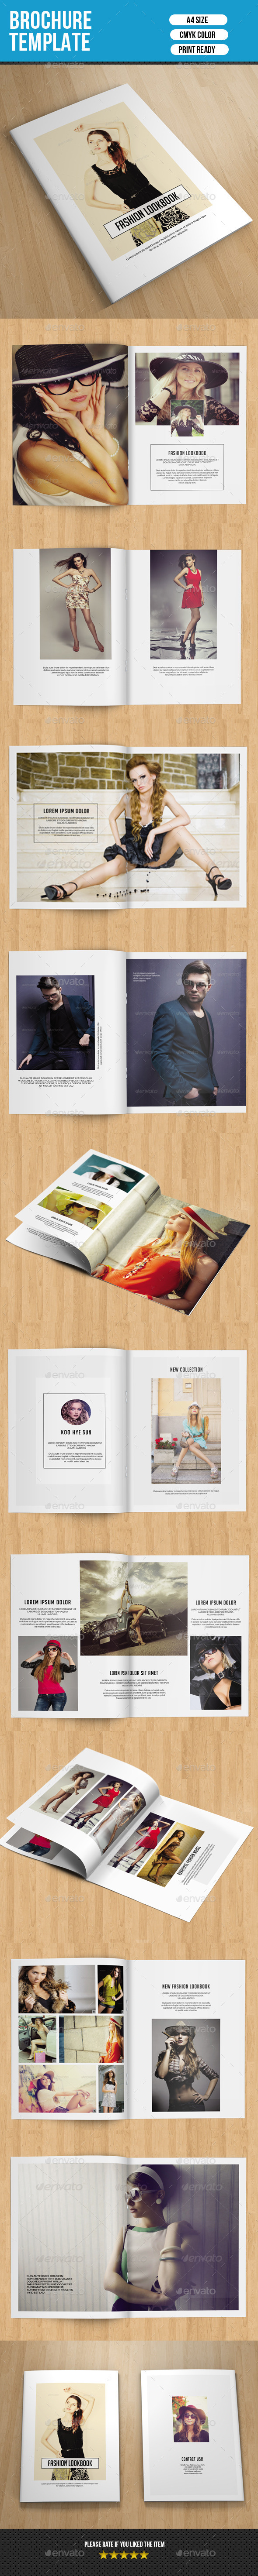 Fashion Lookbook-V216 - Catalogs Brochures